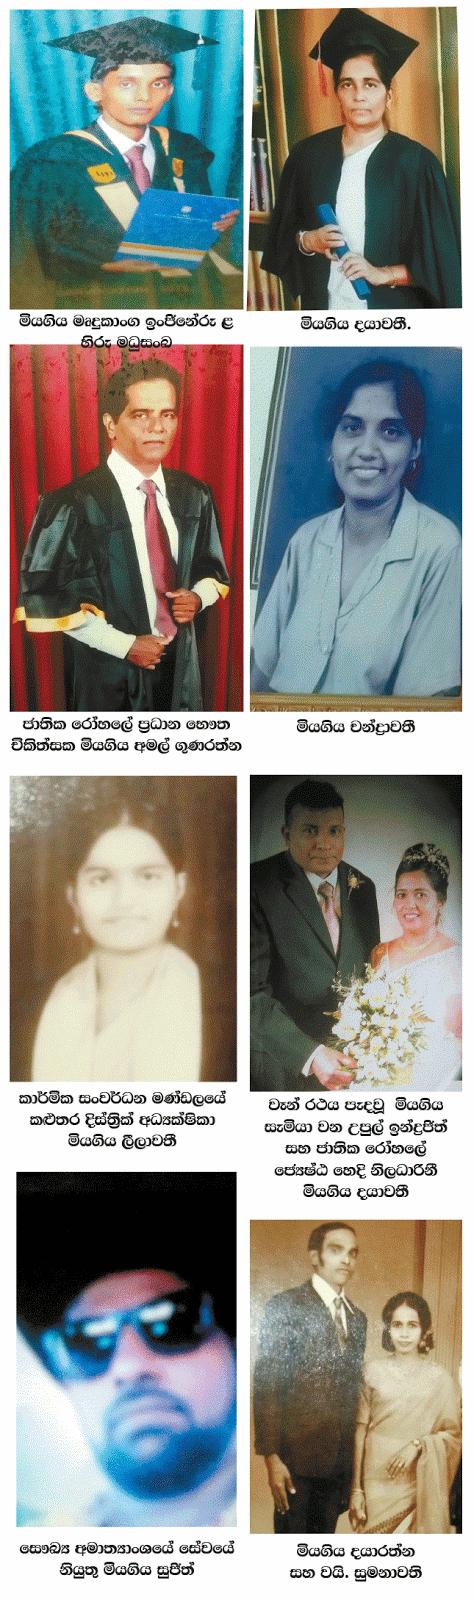 Jaffna accident claims eleven lives